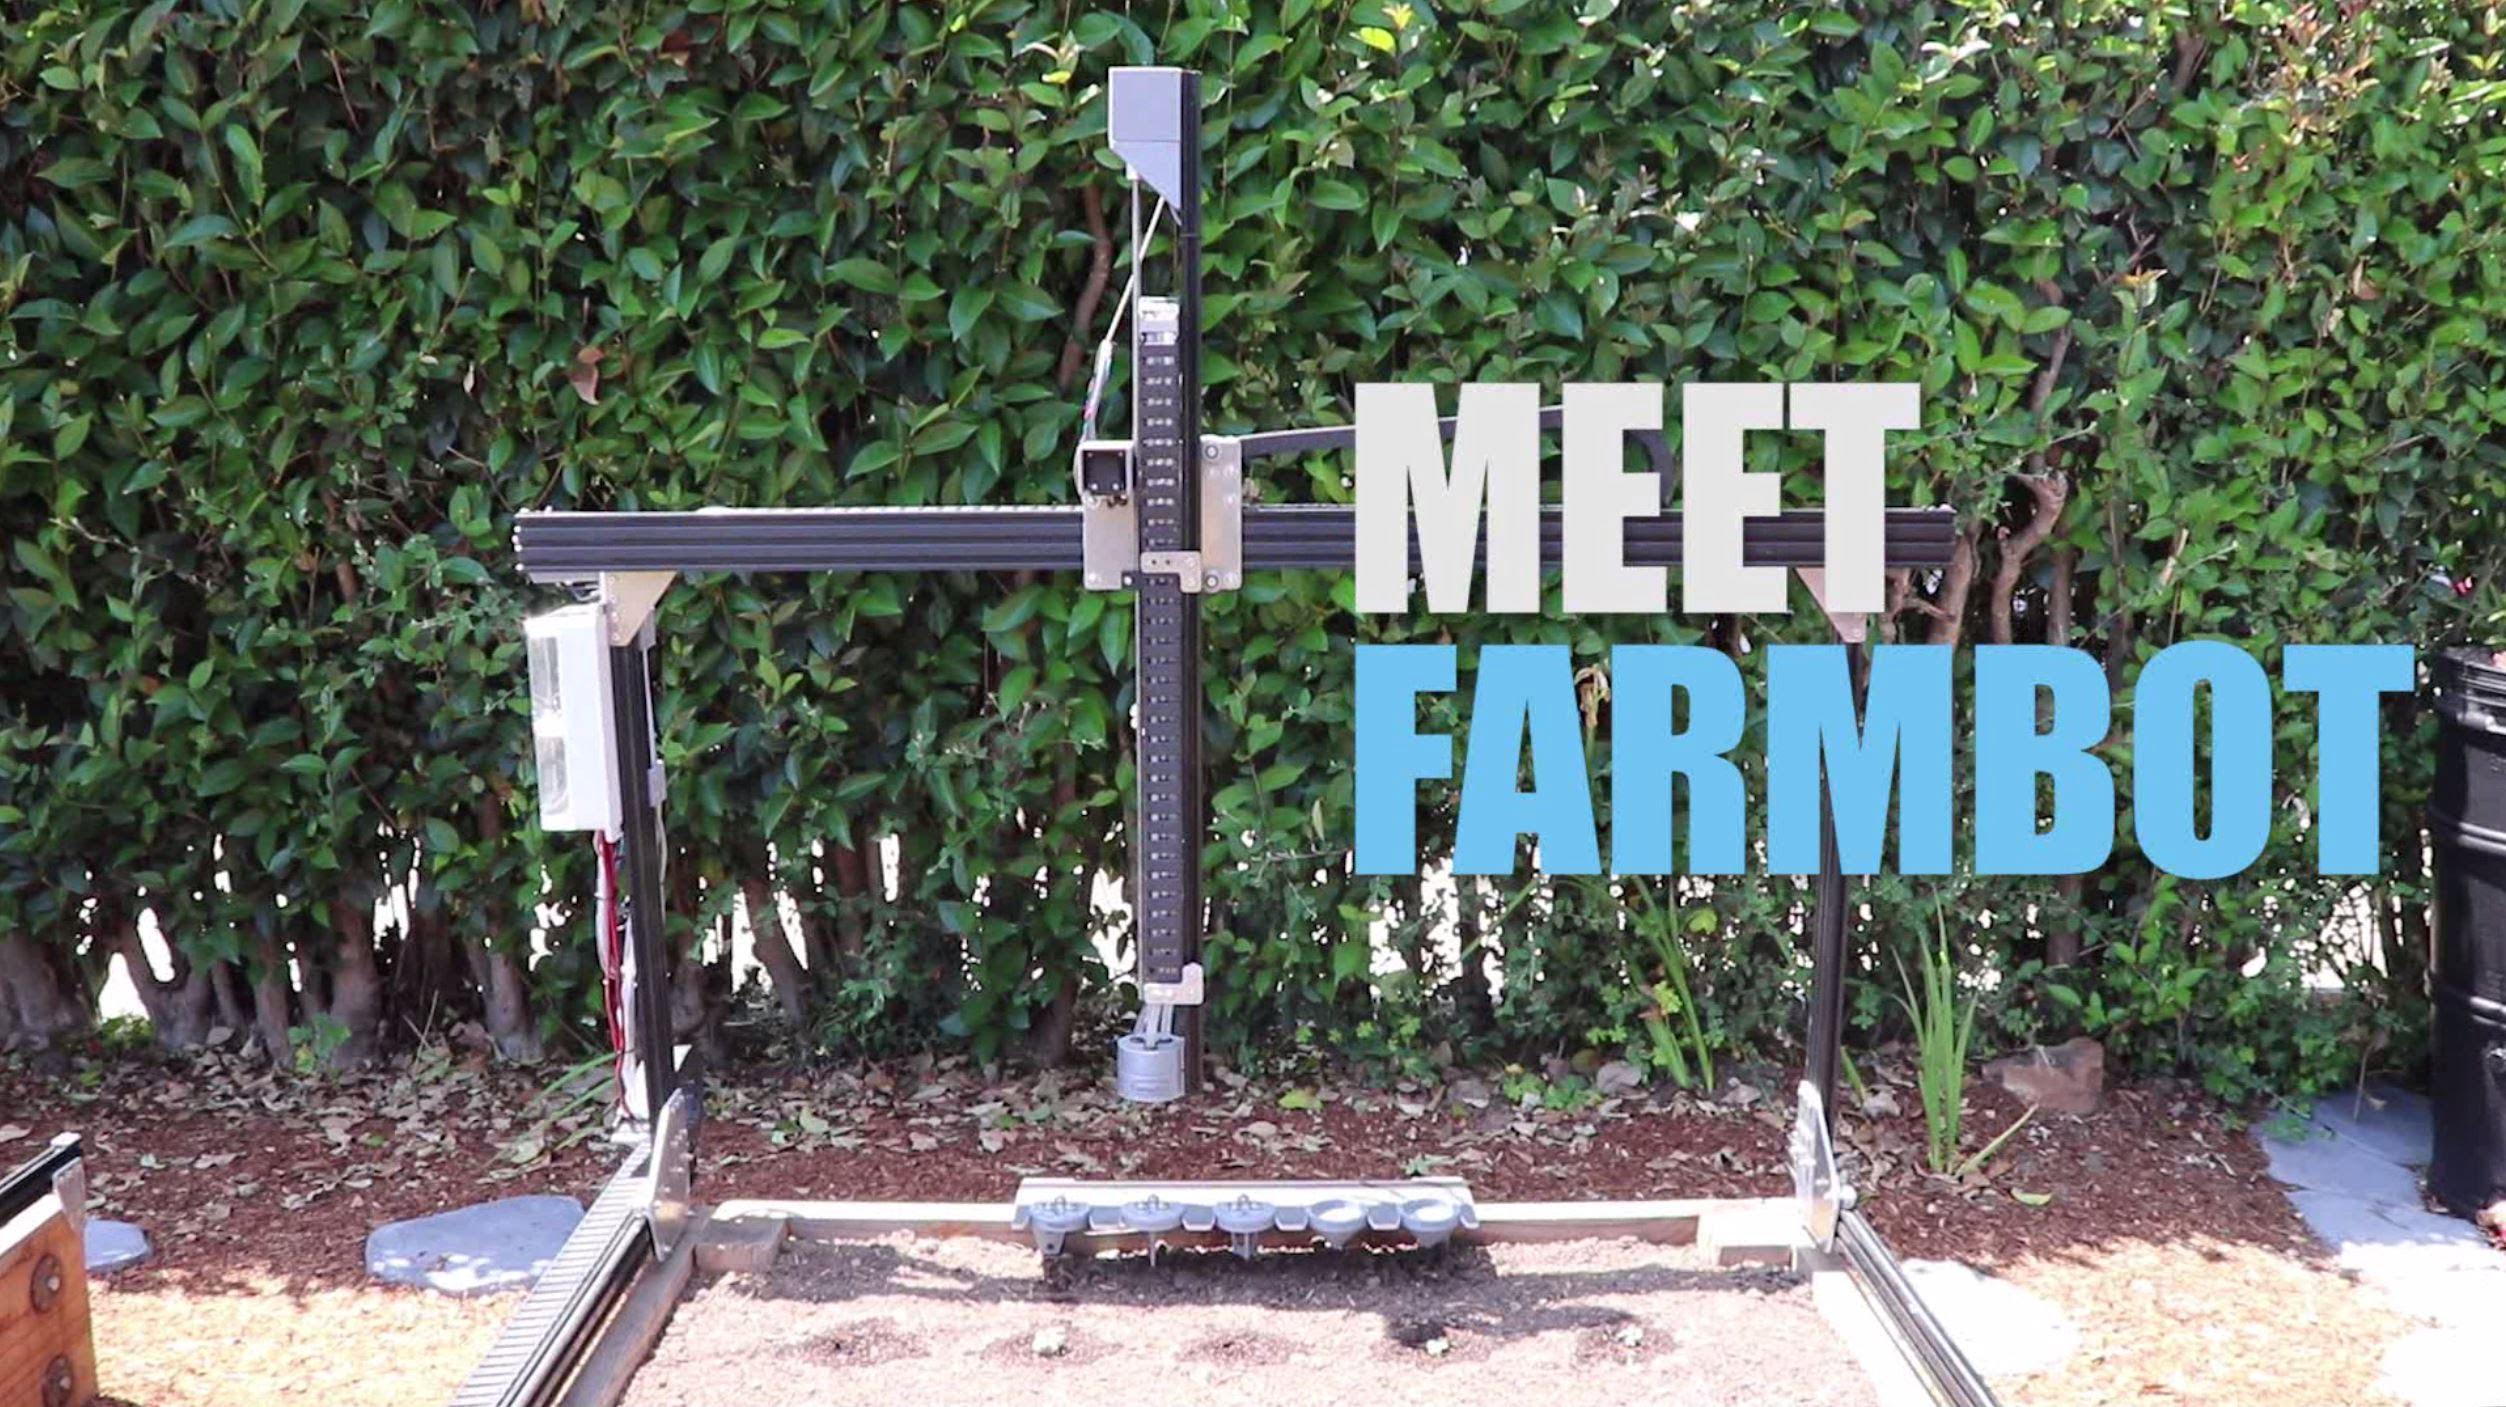 FarmBot - Agtecher: Platform for Agricultural Technology